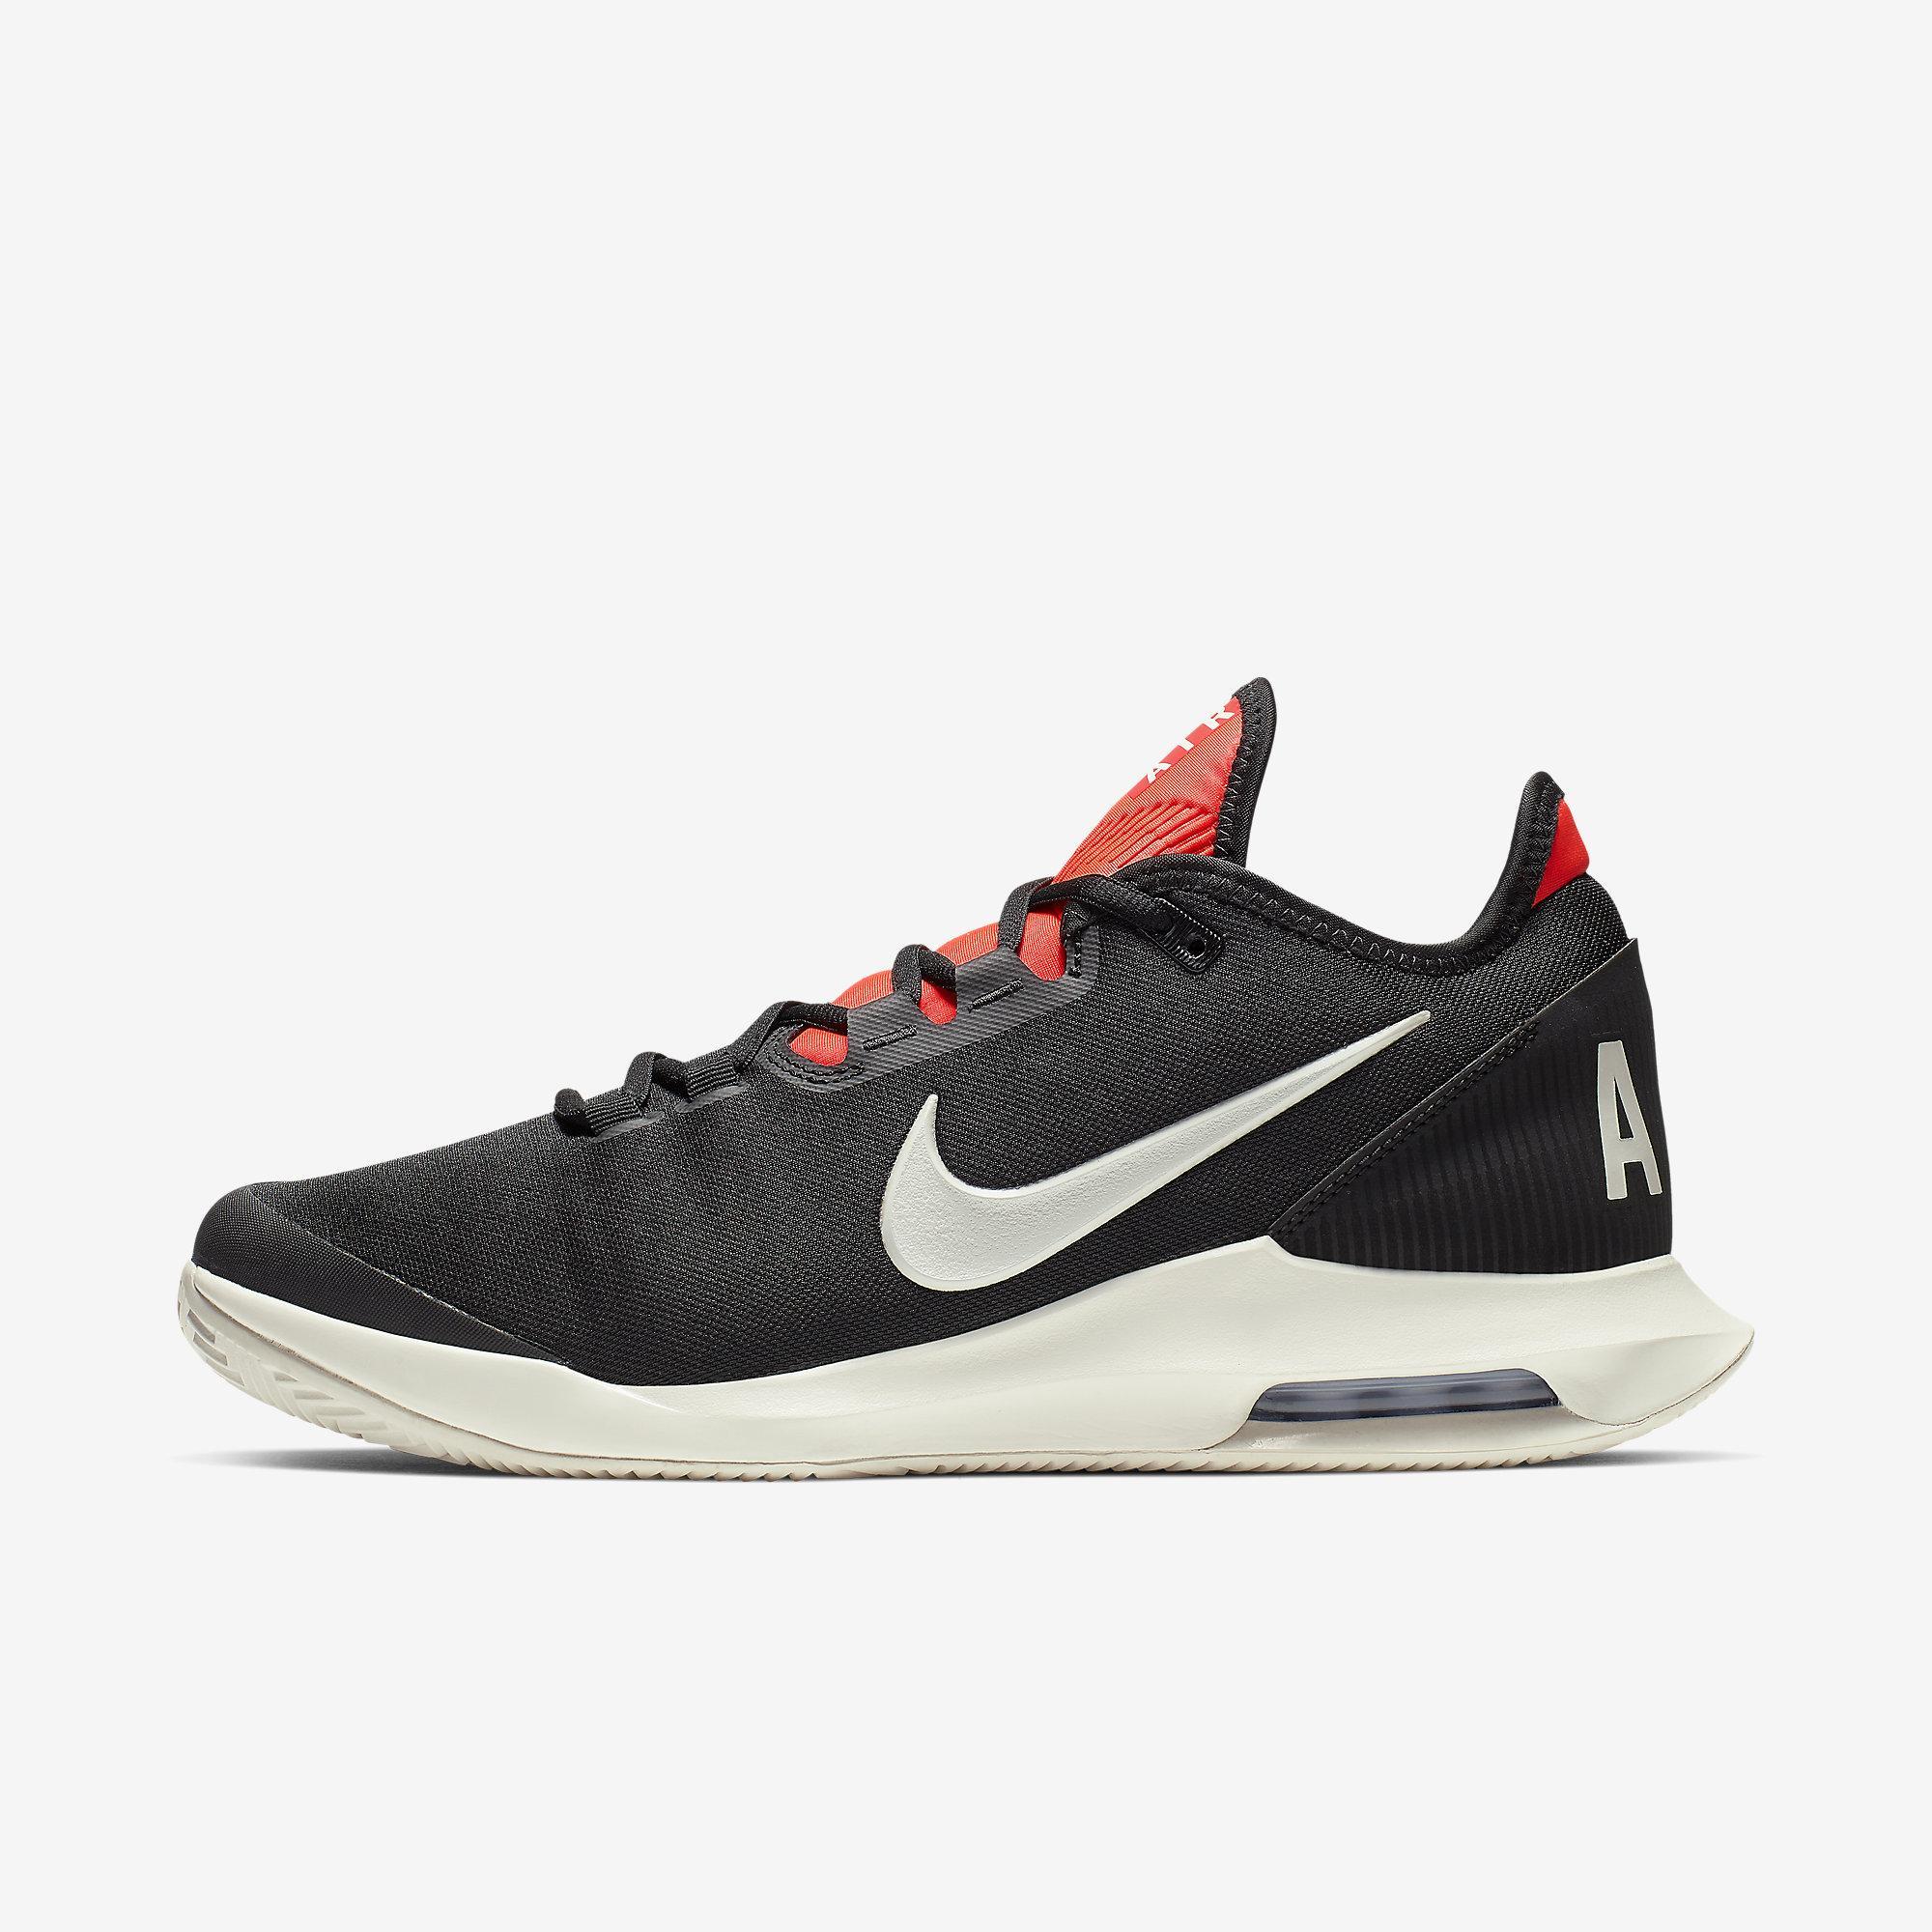 Nike Mens Air Max Wildcard Clay Tennis Shoes BlackPhantomBright Crimson